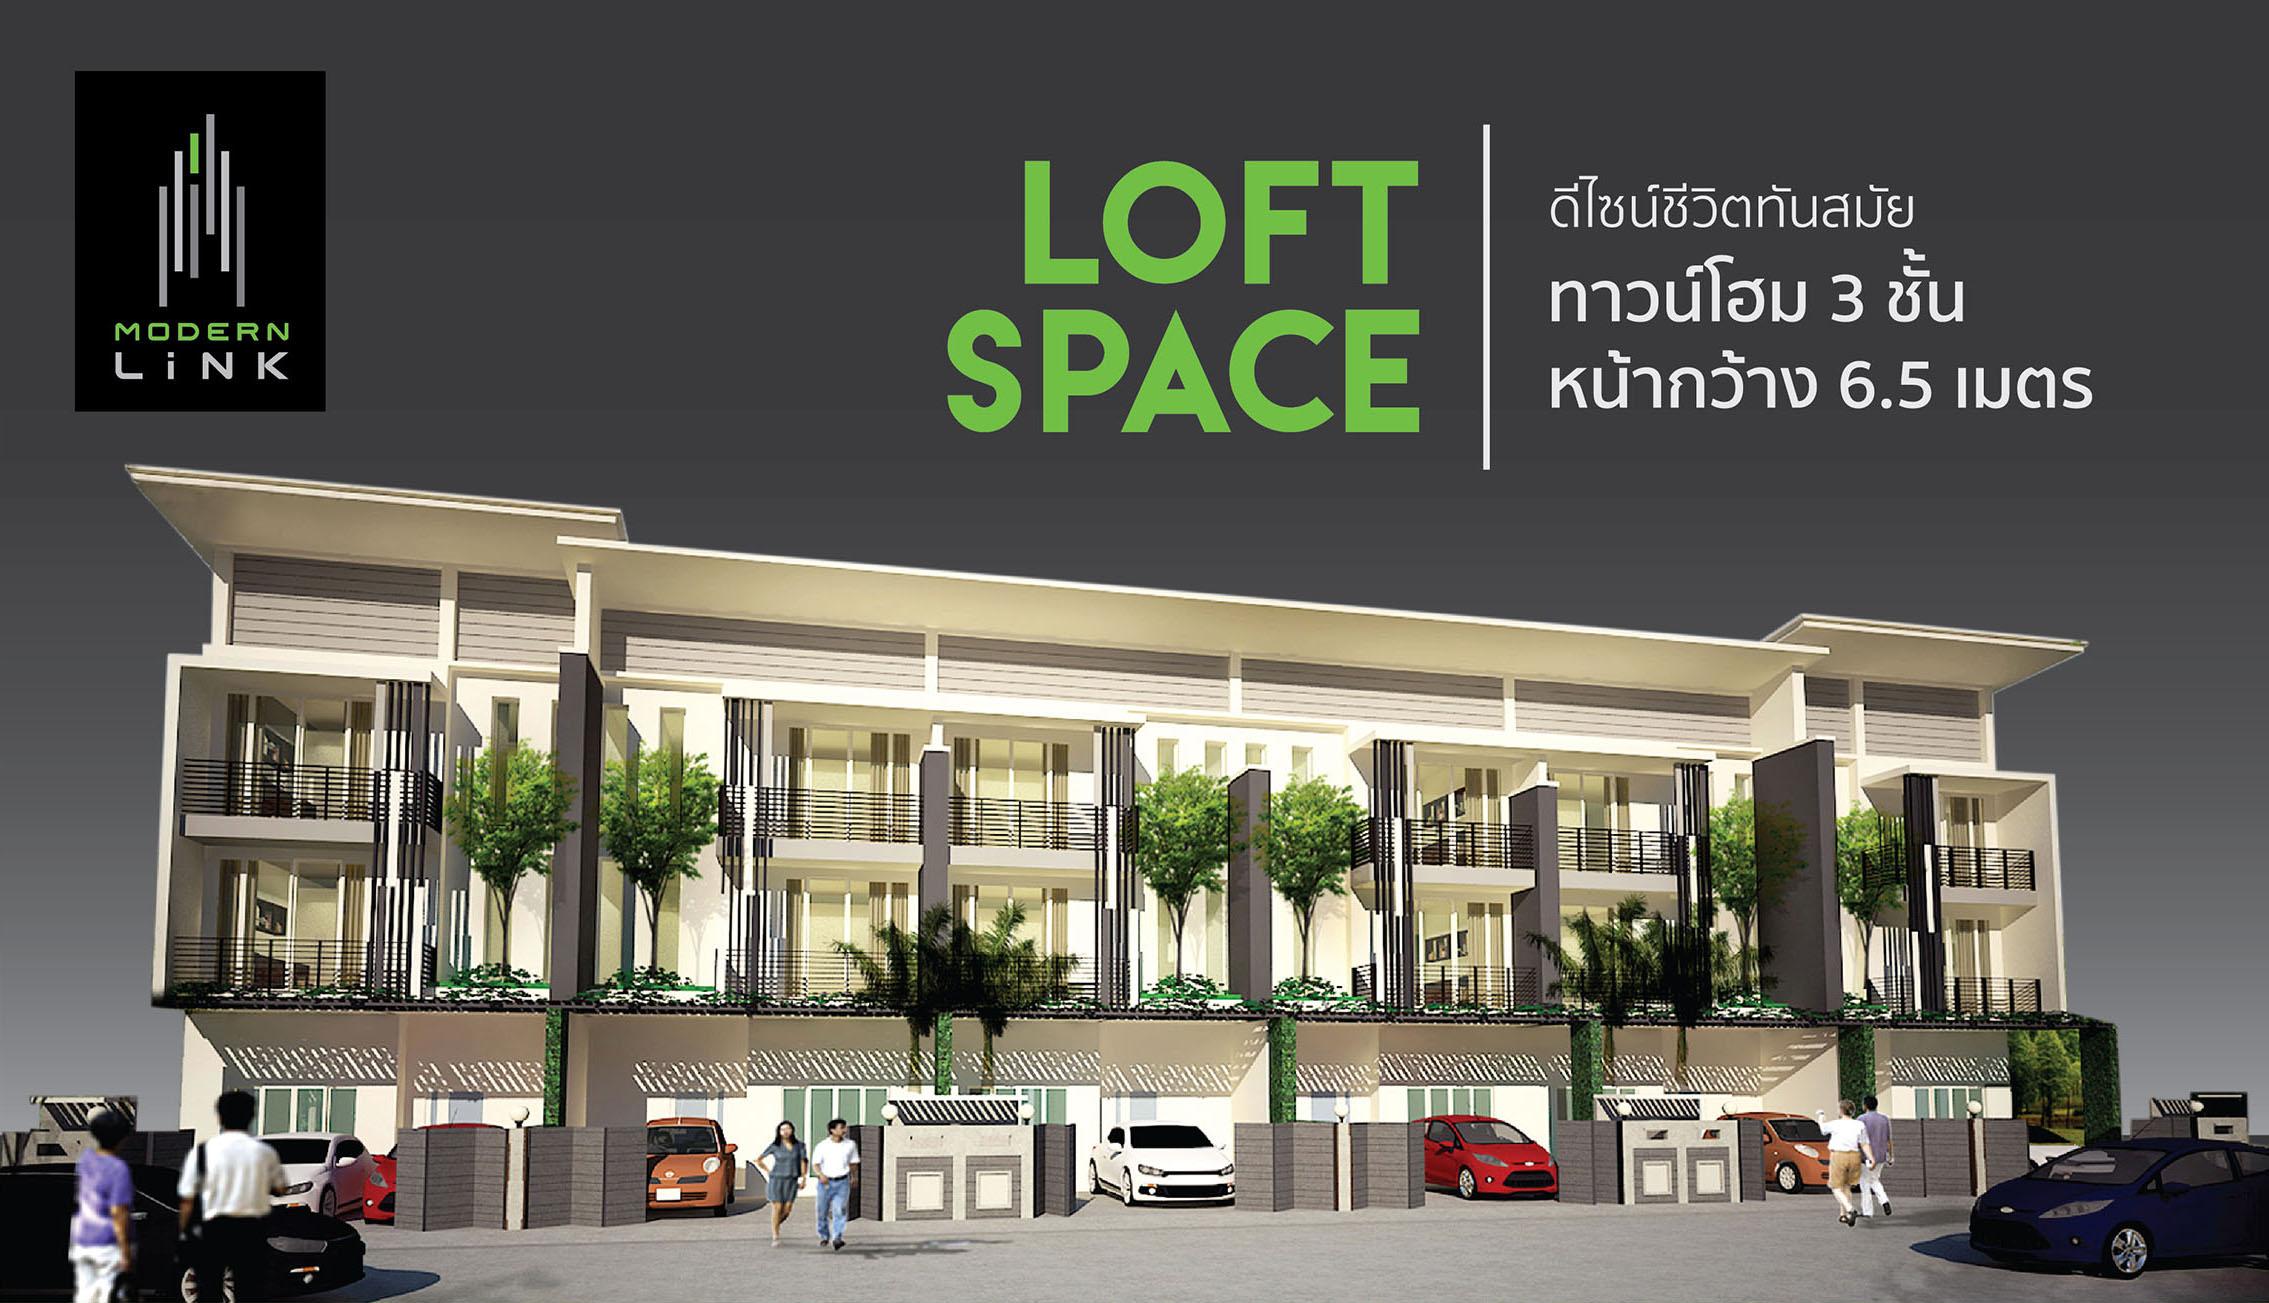 LOFT SPACE modern link โคราช